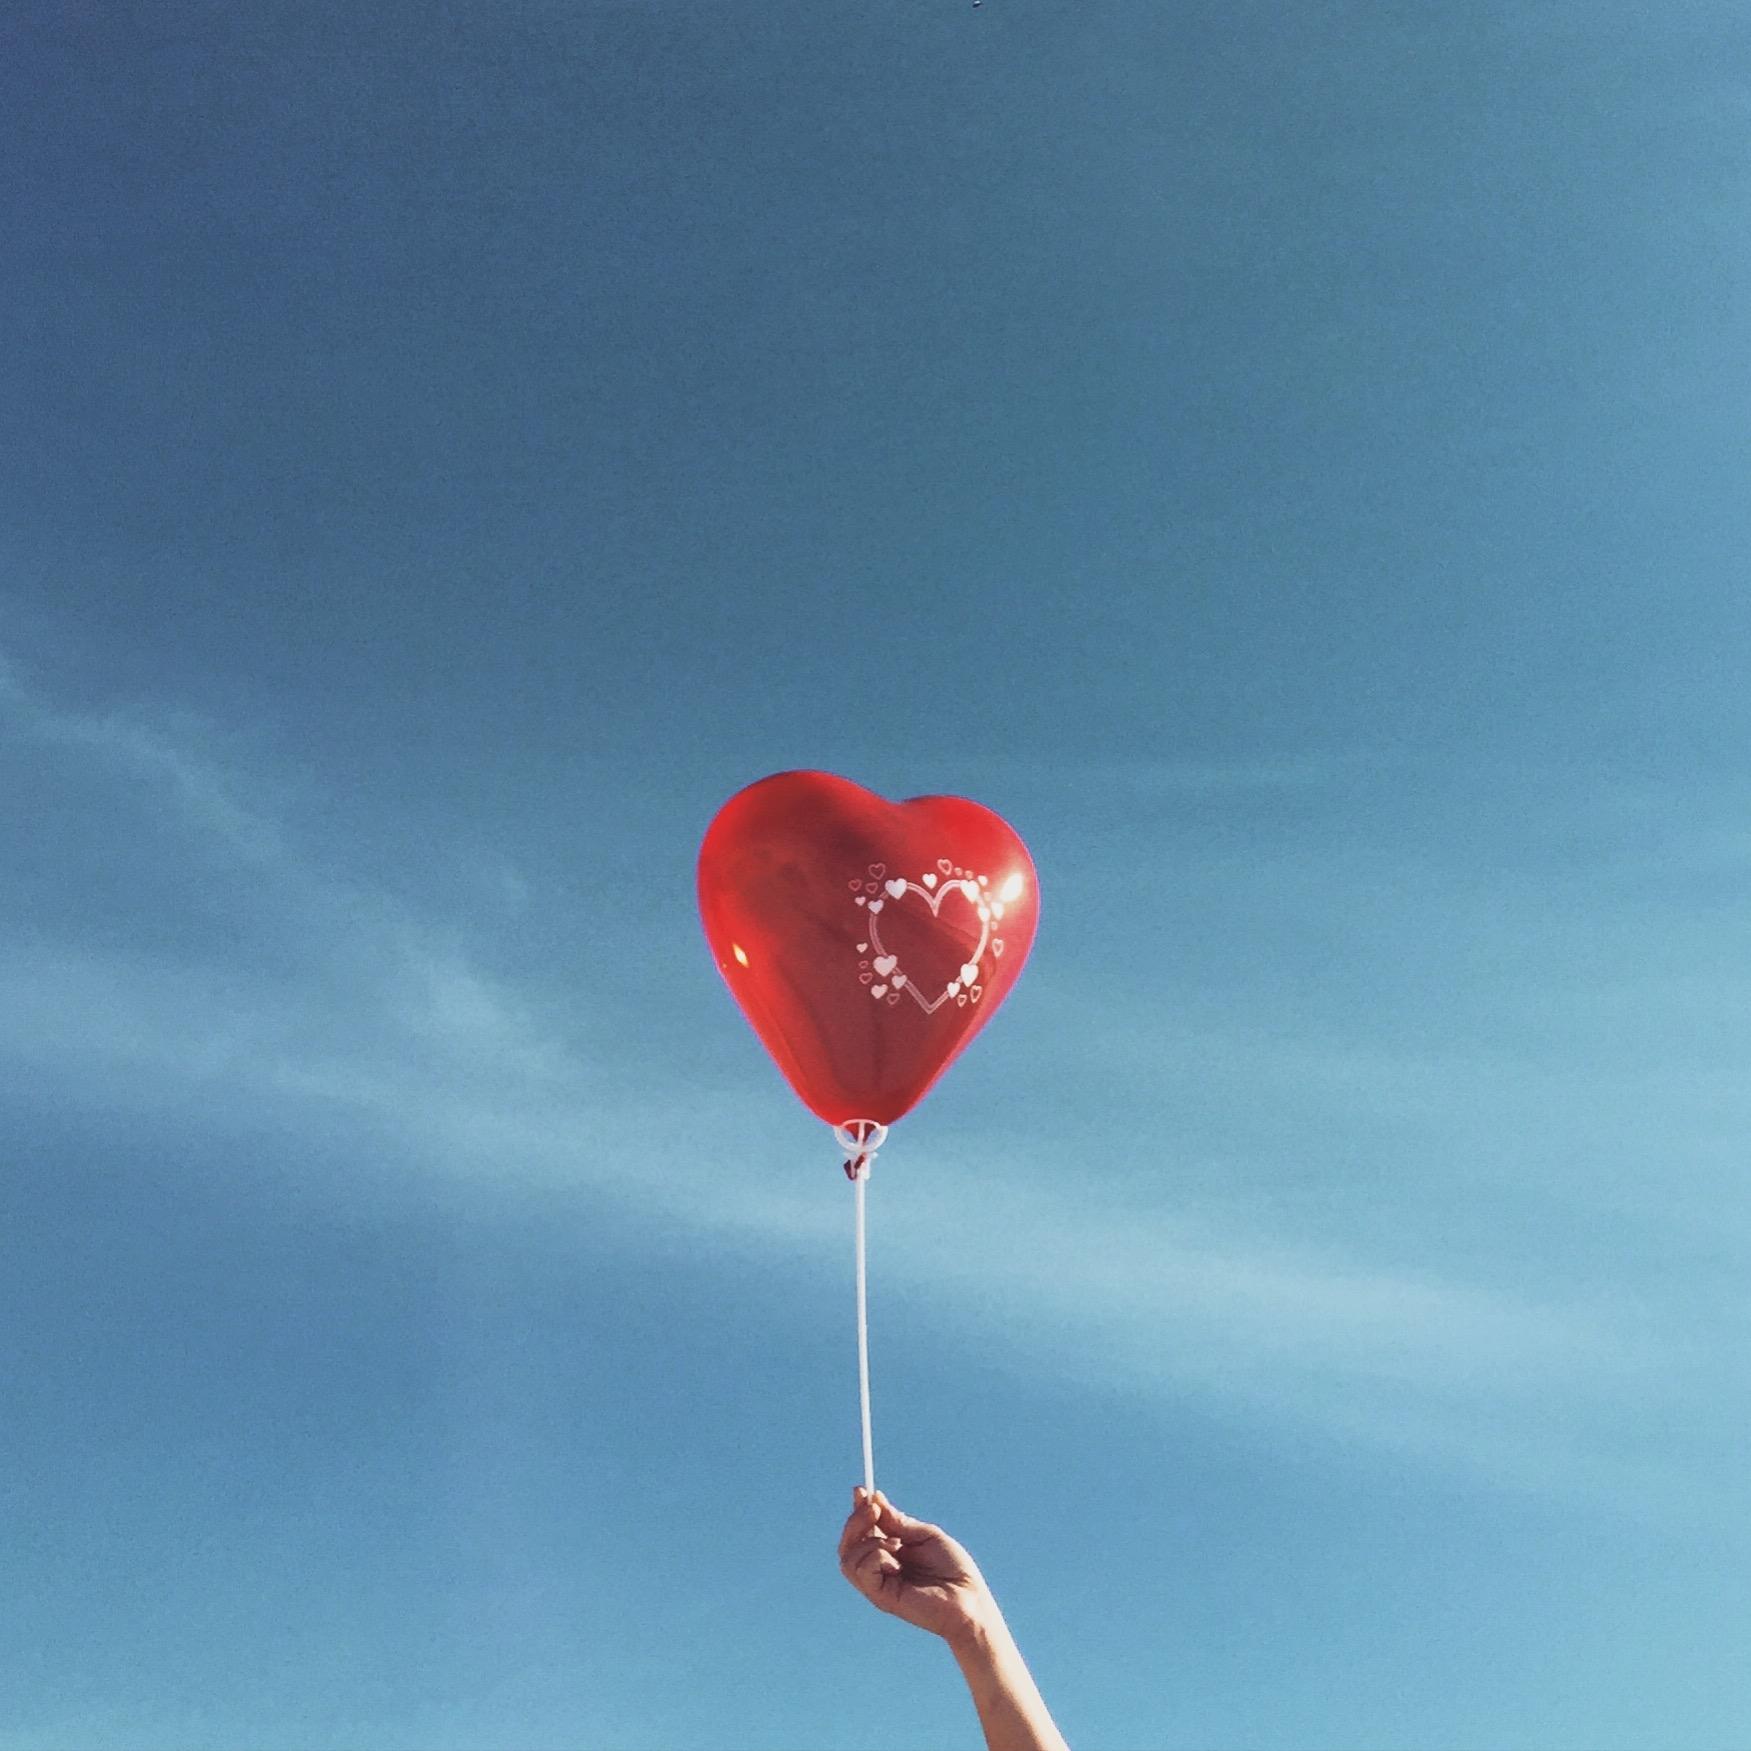 Vital Spa Valentine's Day Miami Specials - Get Ink PR